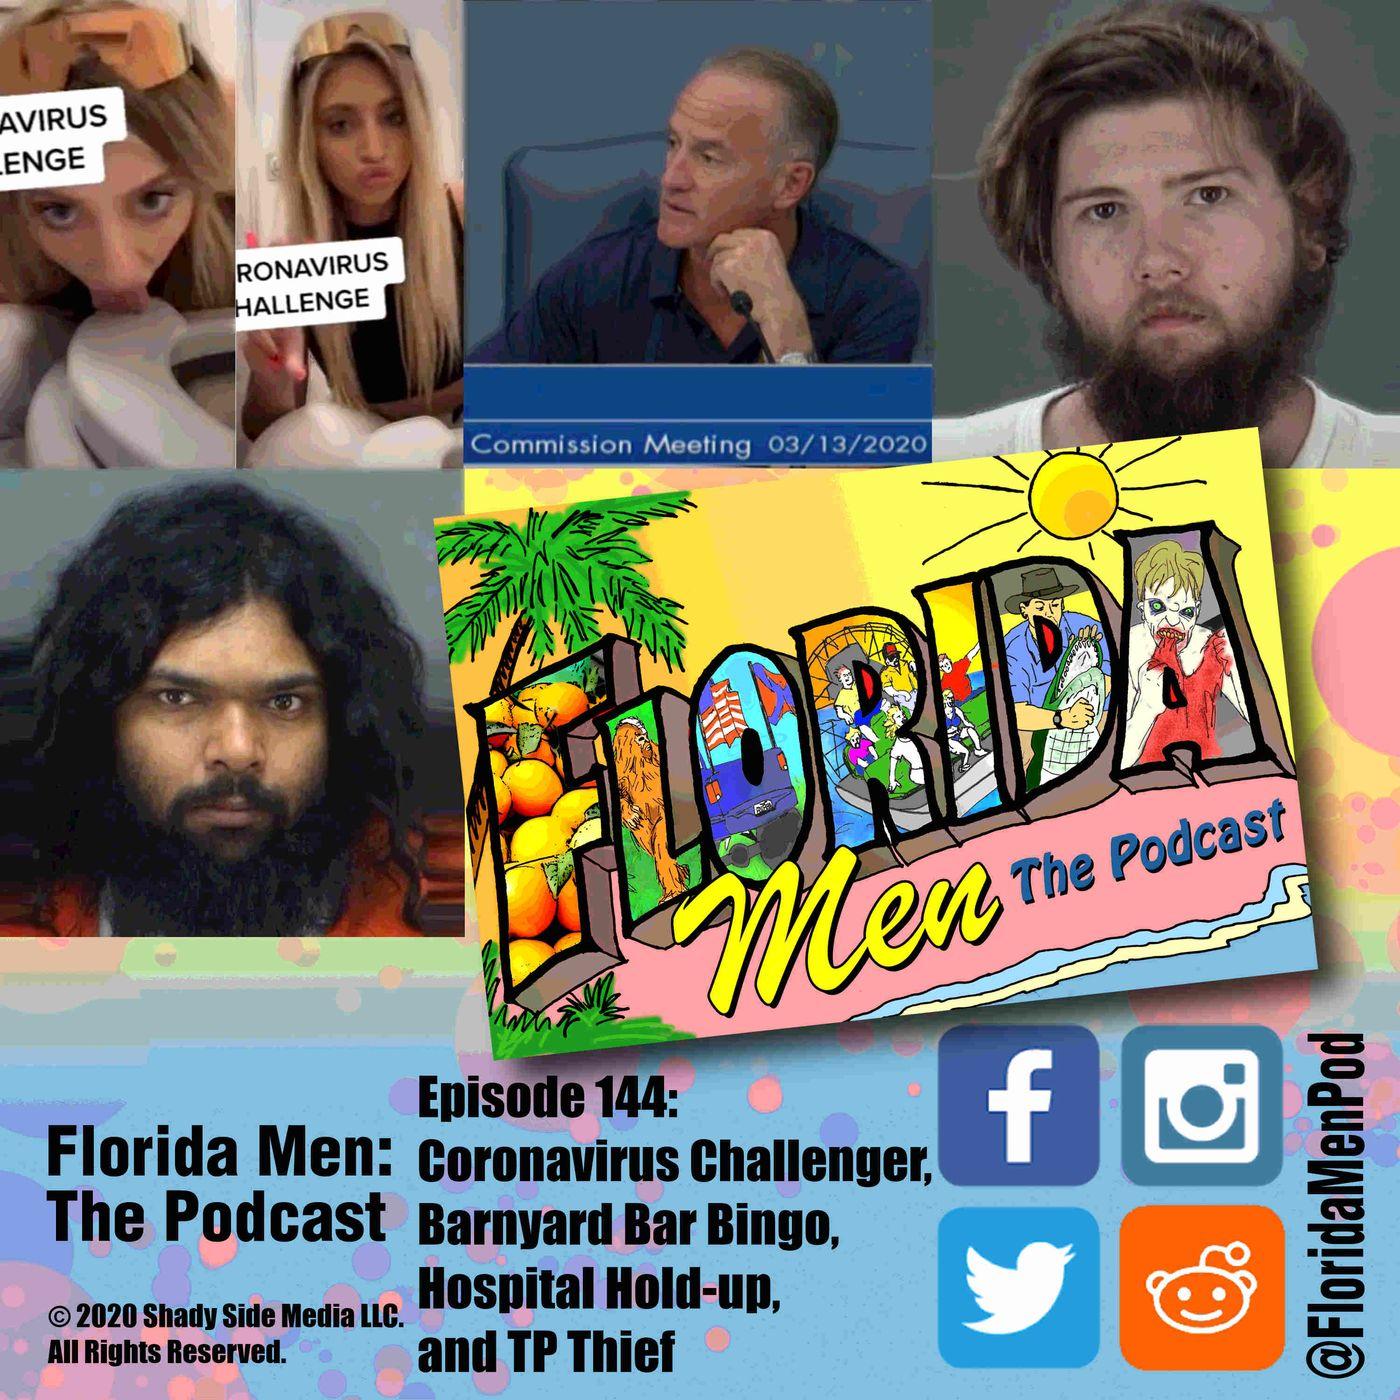 144 - Coronavirus Challenger, Barnyard Bar Bingo, Hospital Hold-up, and TP Thief